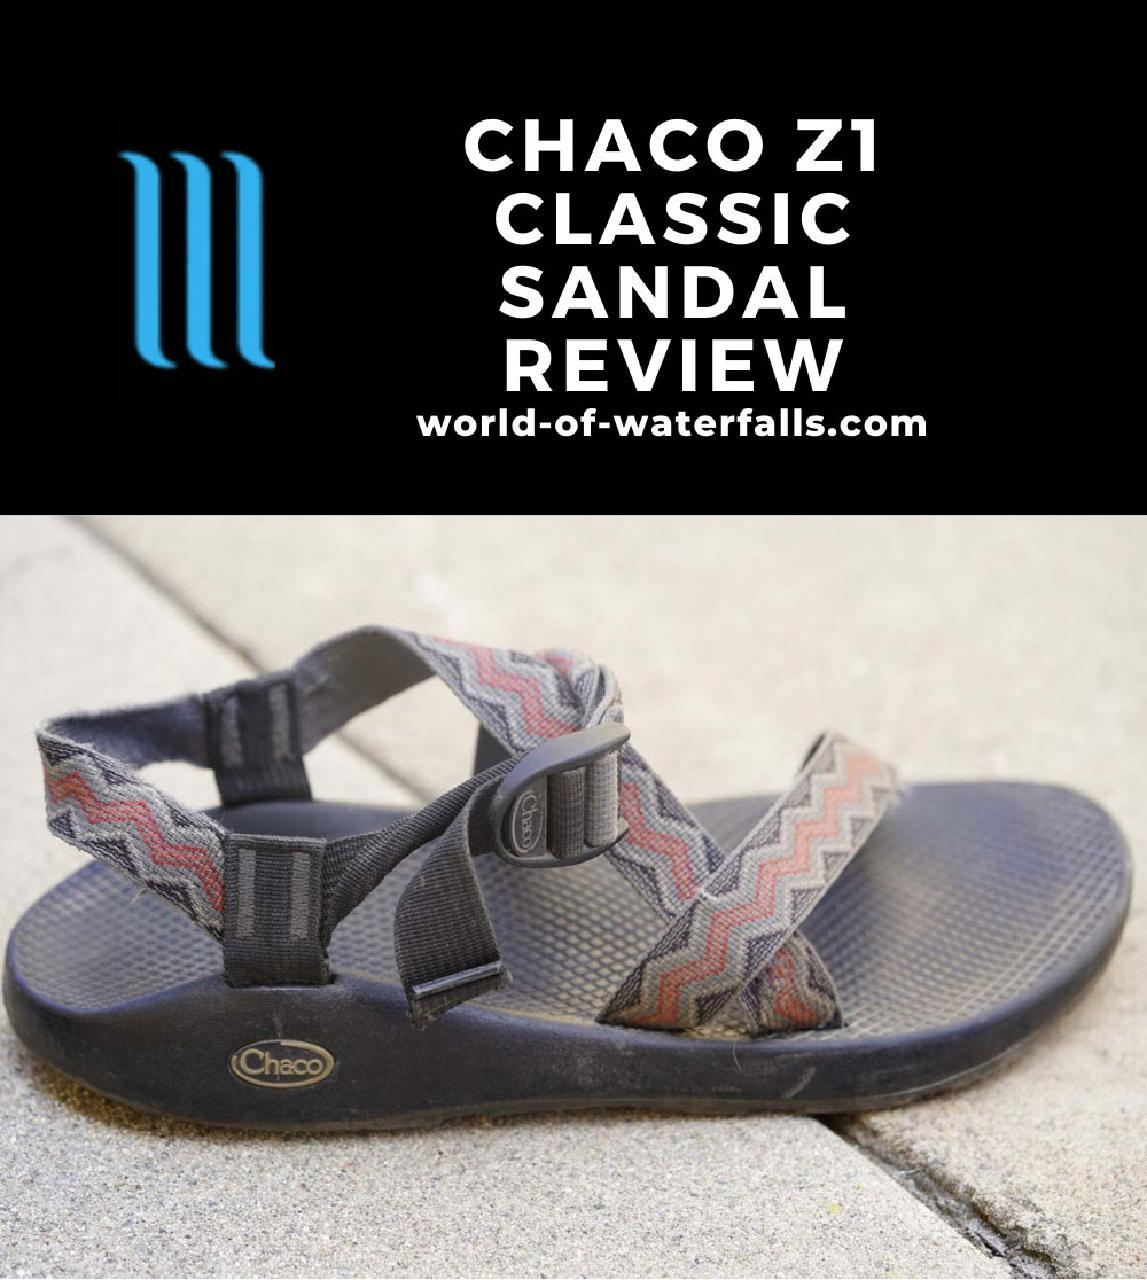 My worn Chaco Z1 Classic Sandal